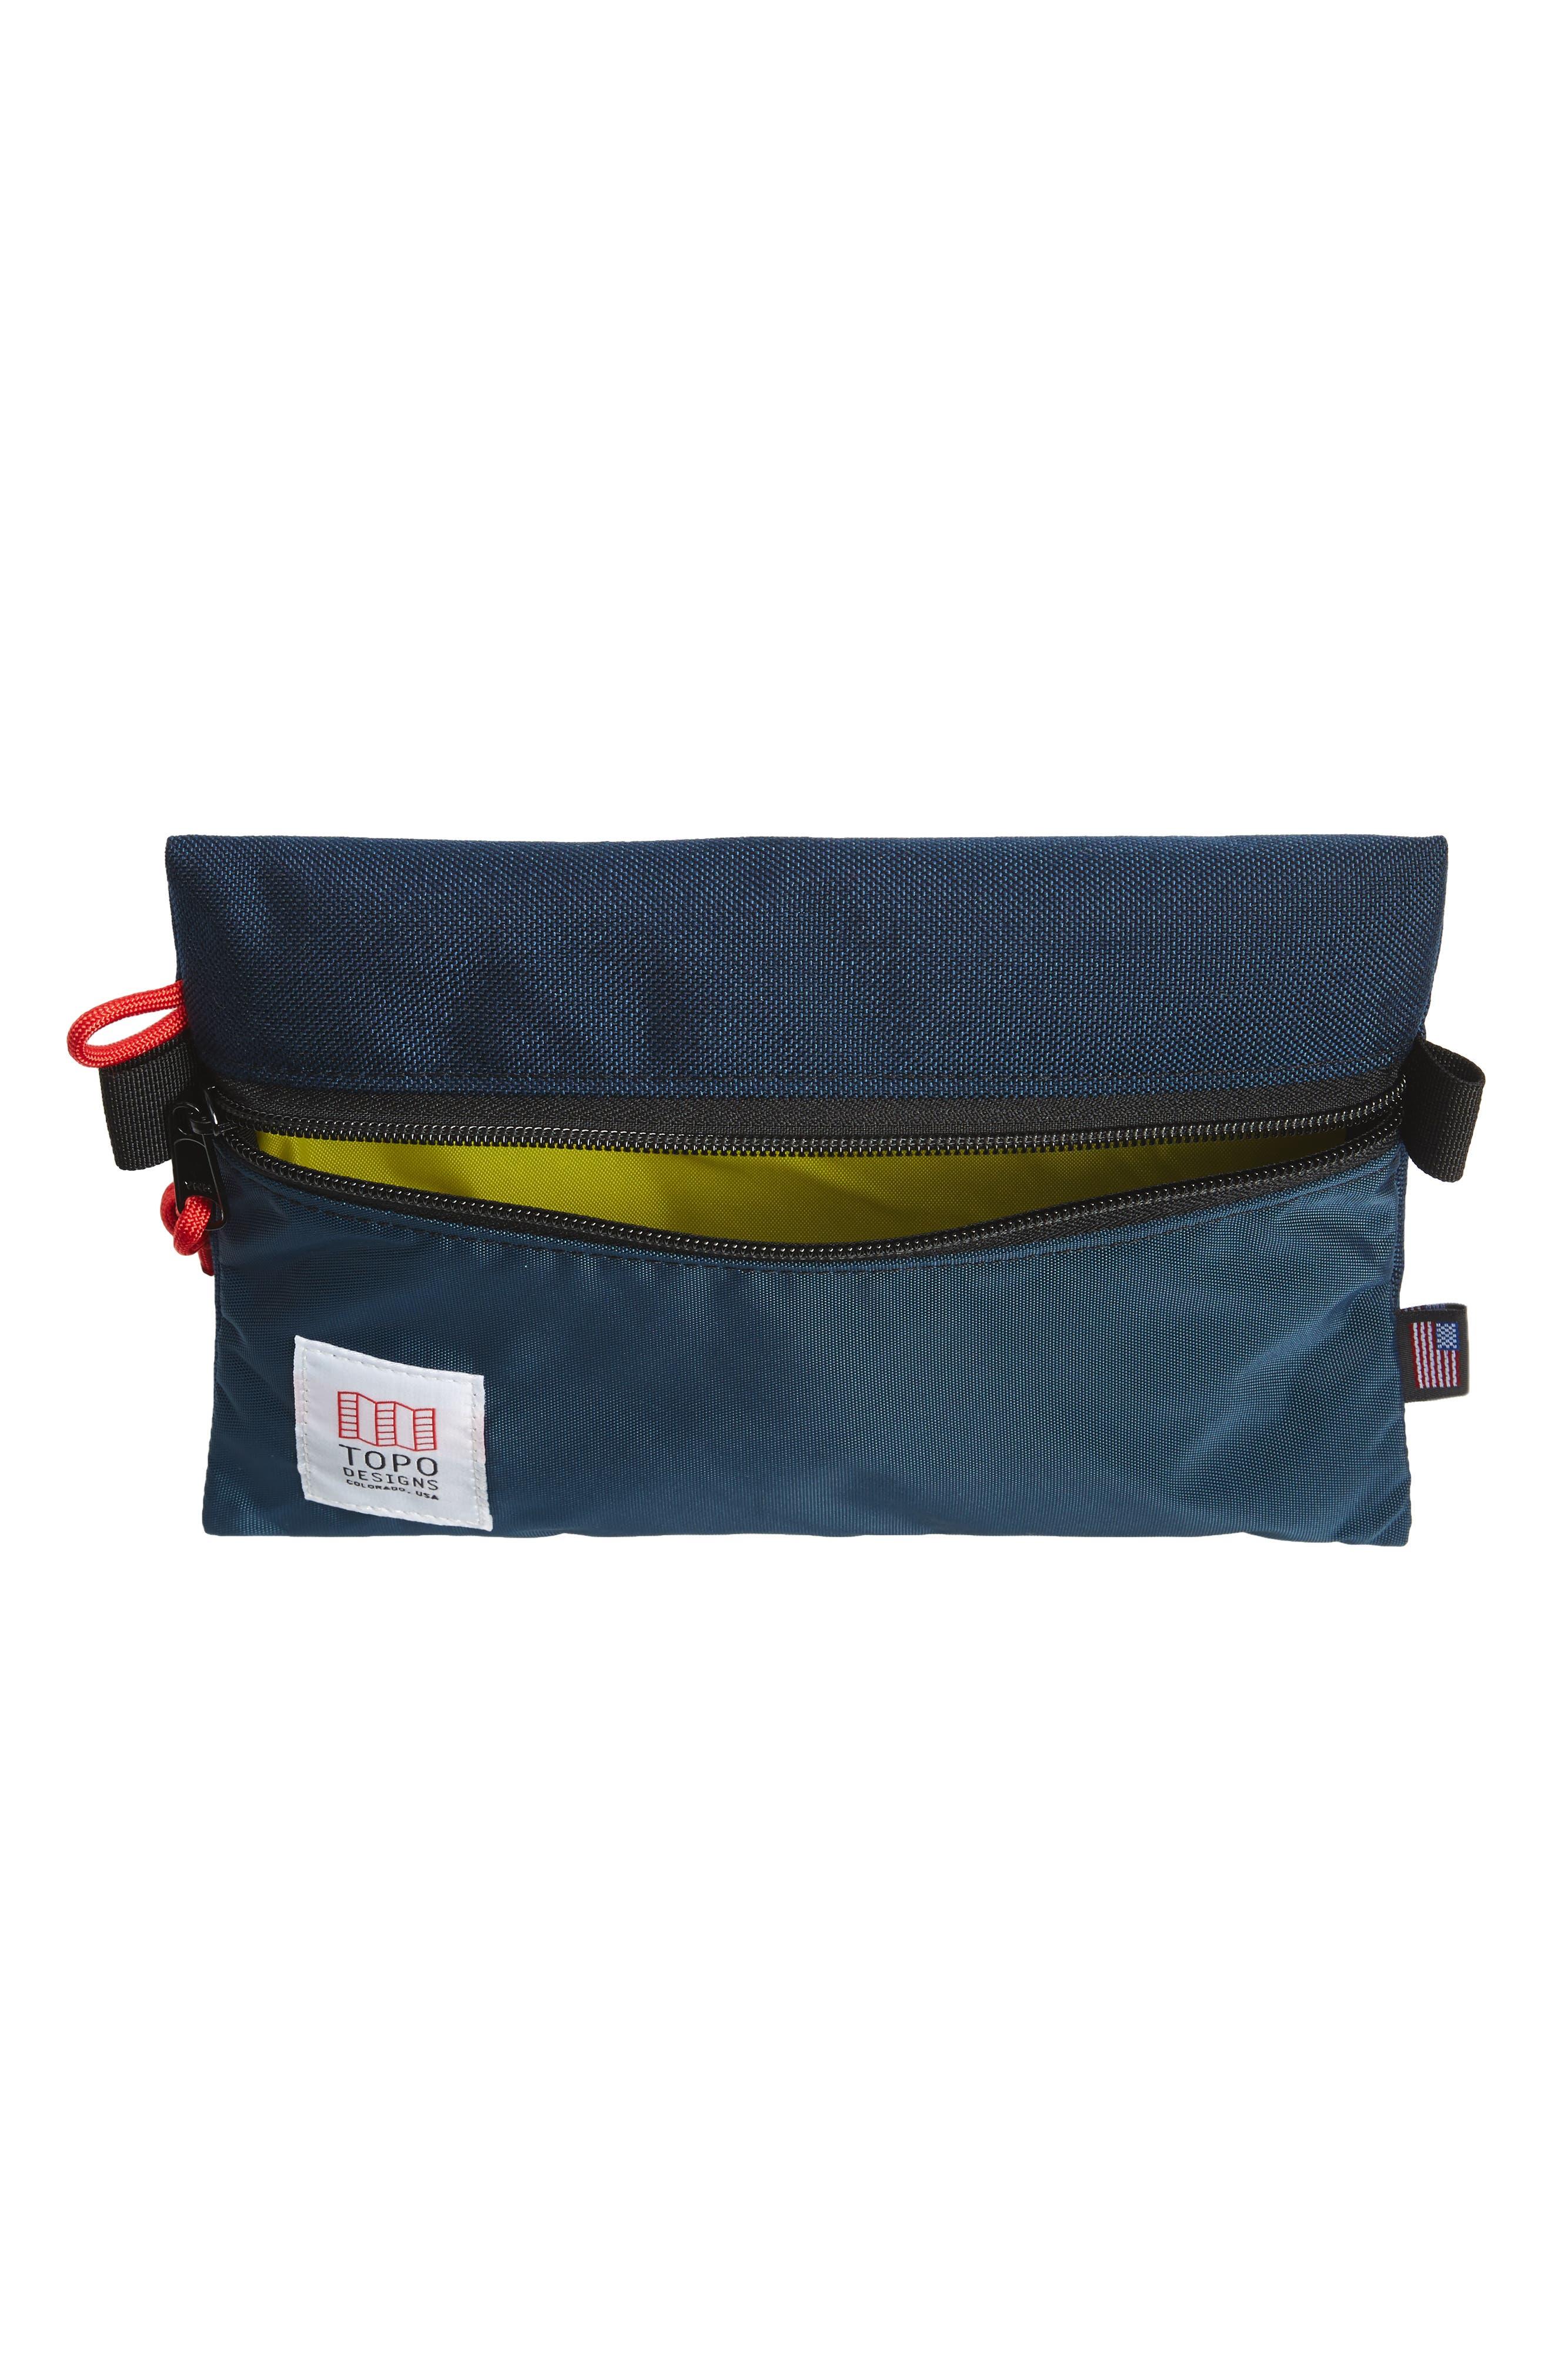 Alternate Image 3  - TopoDesigns Accessory Bag